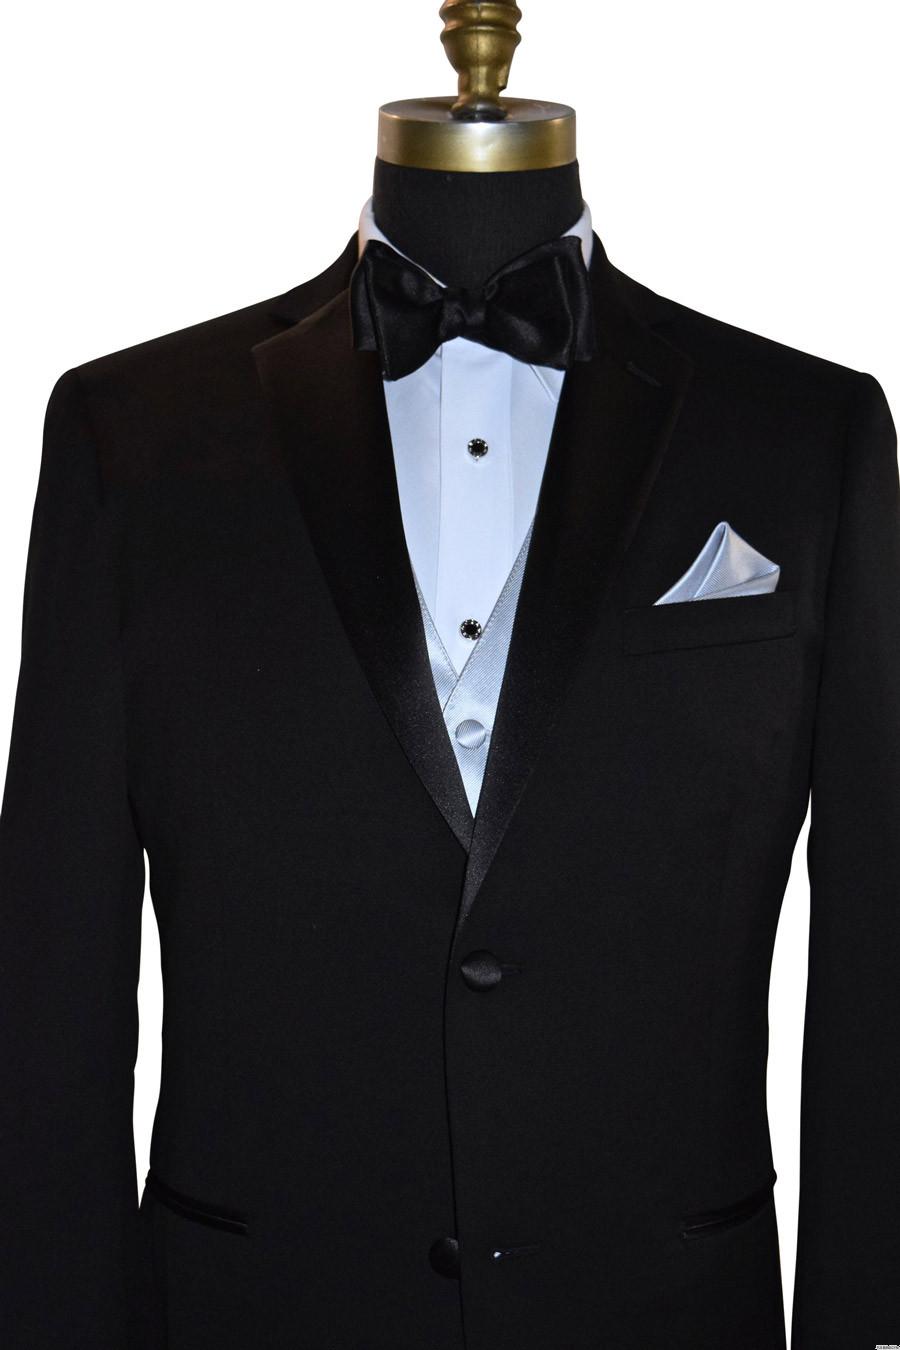 silver tuxedo vest with black bowtie on tuxbling.com